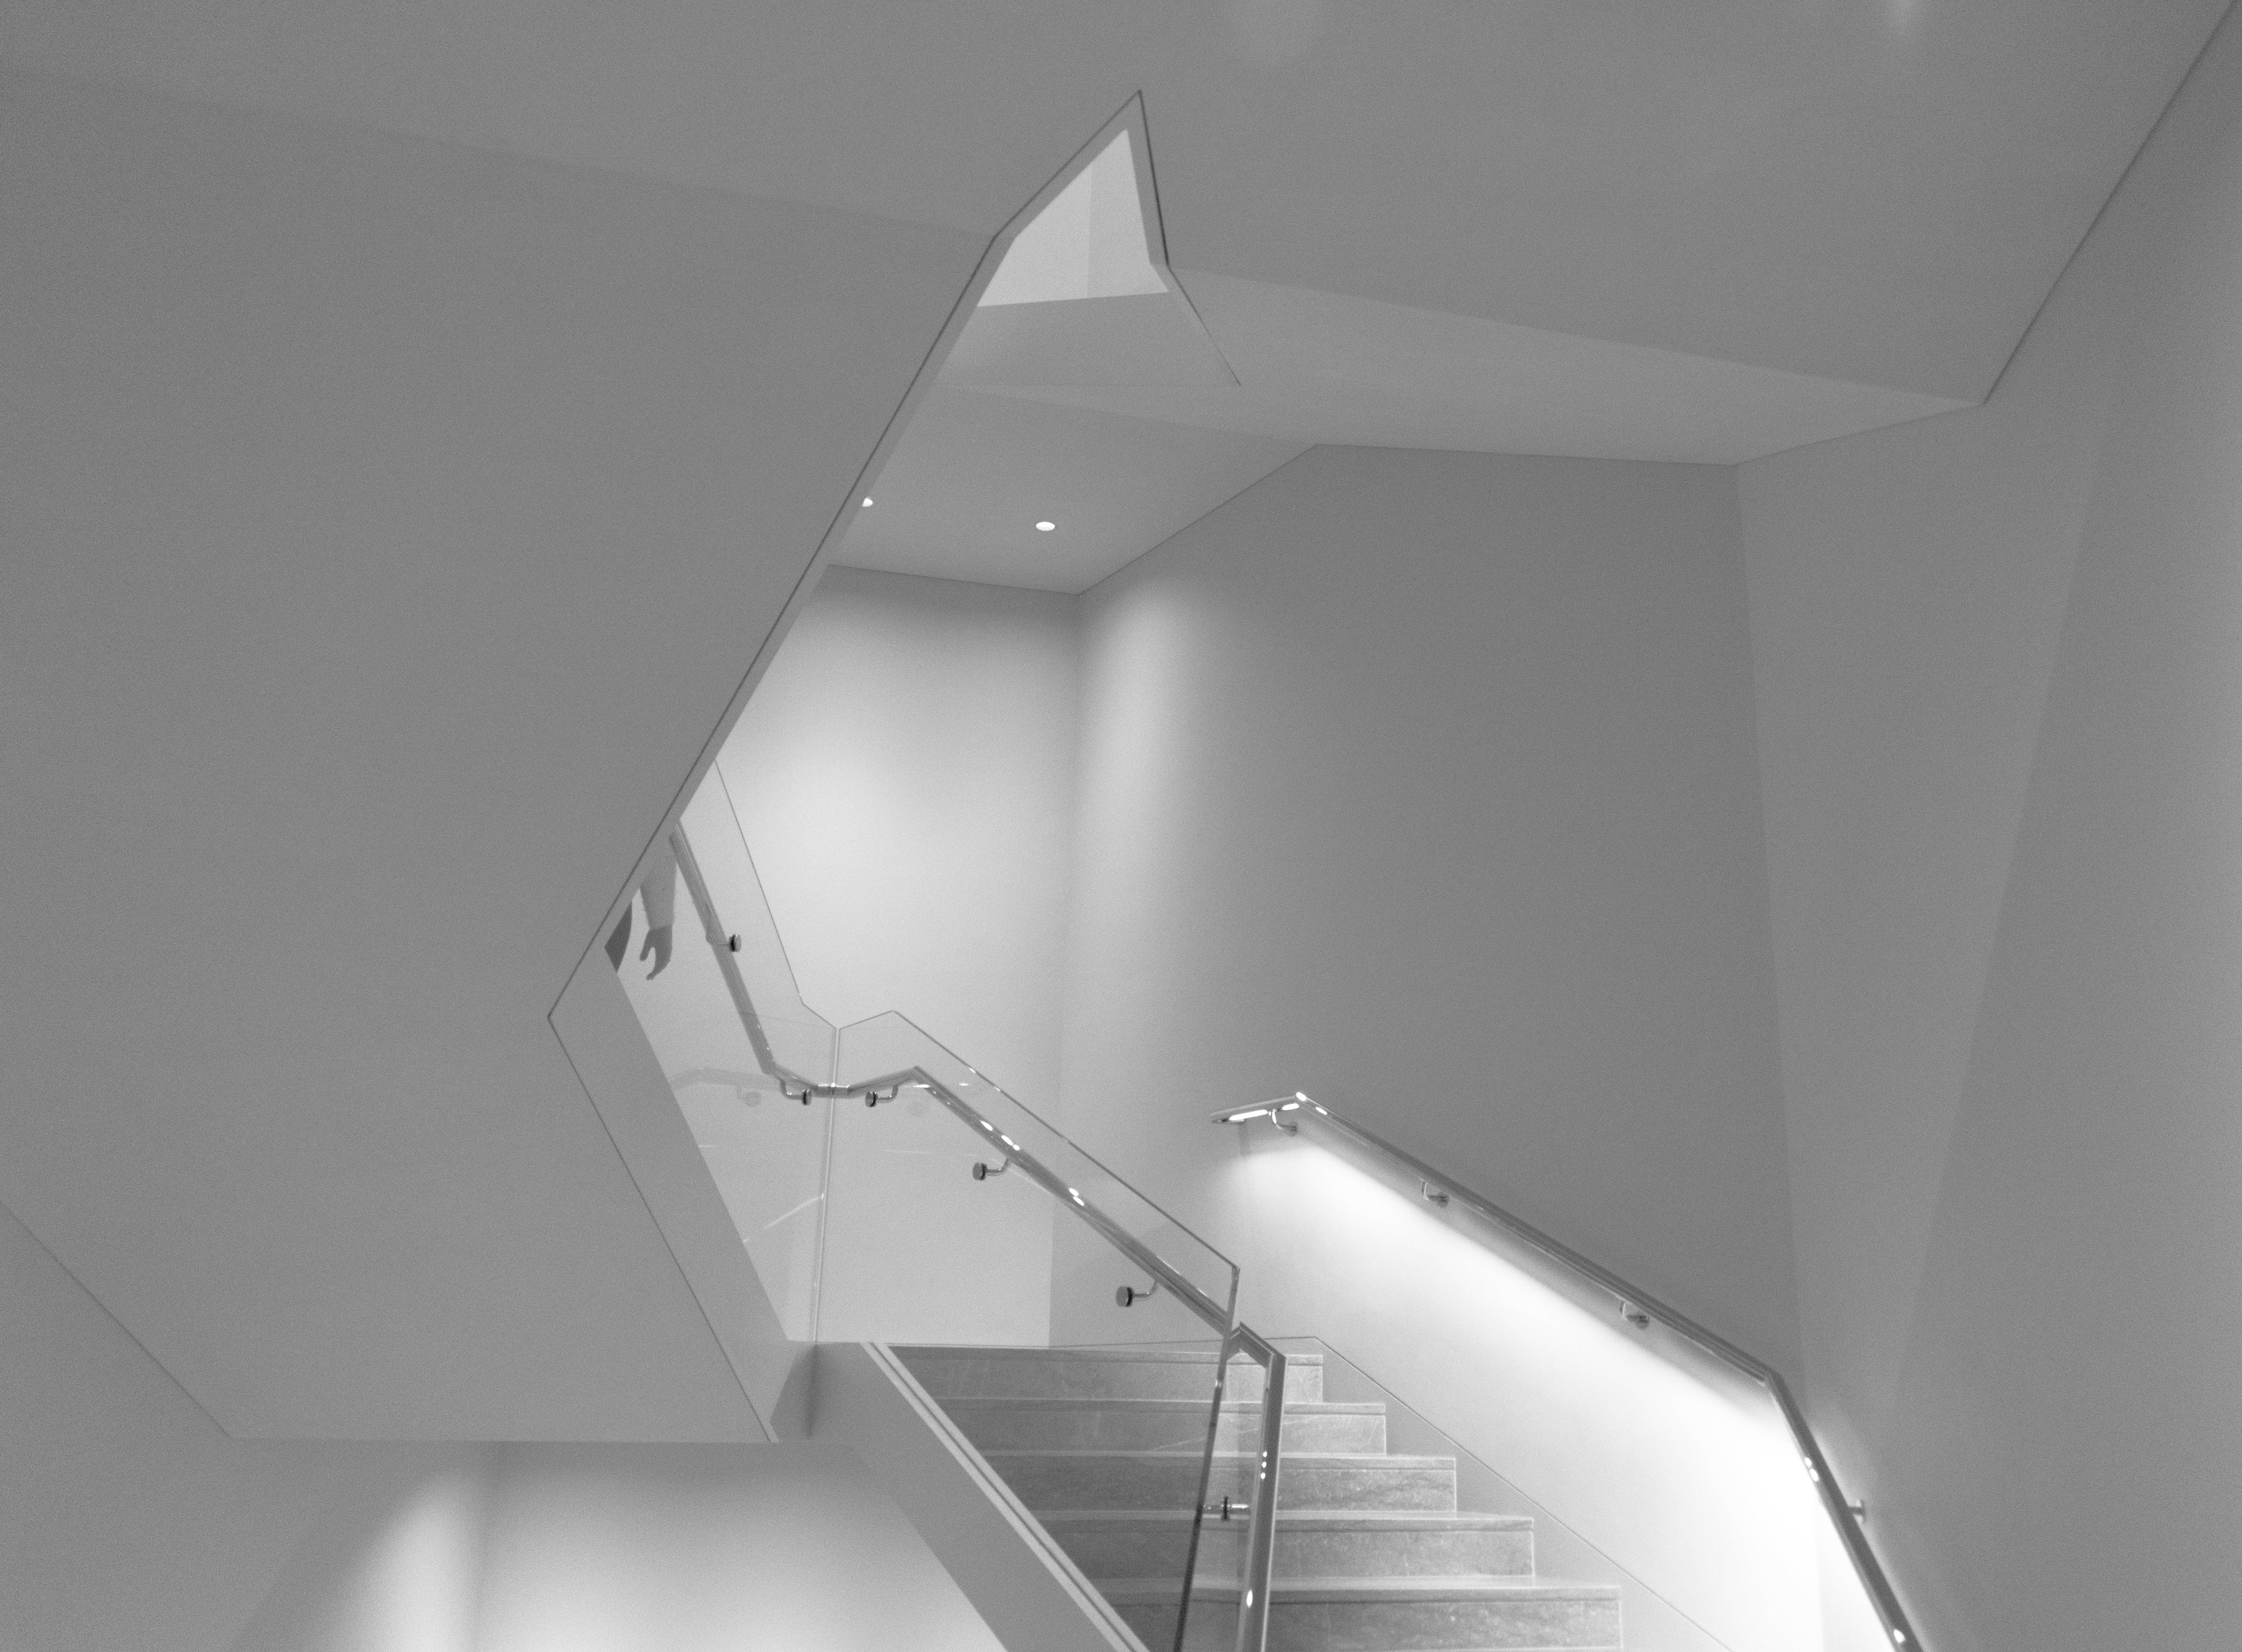 Gratis arkivbilde med trapp